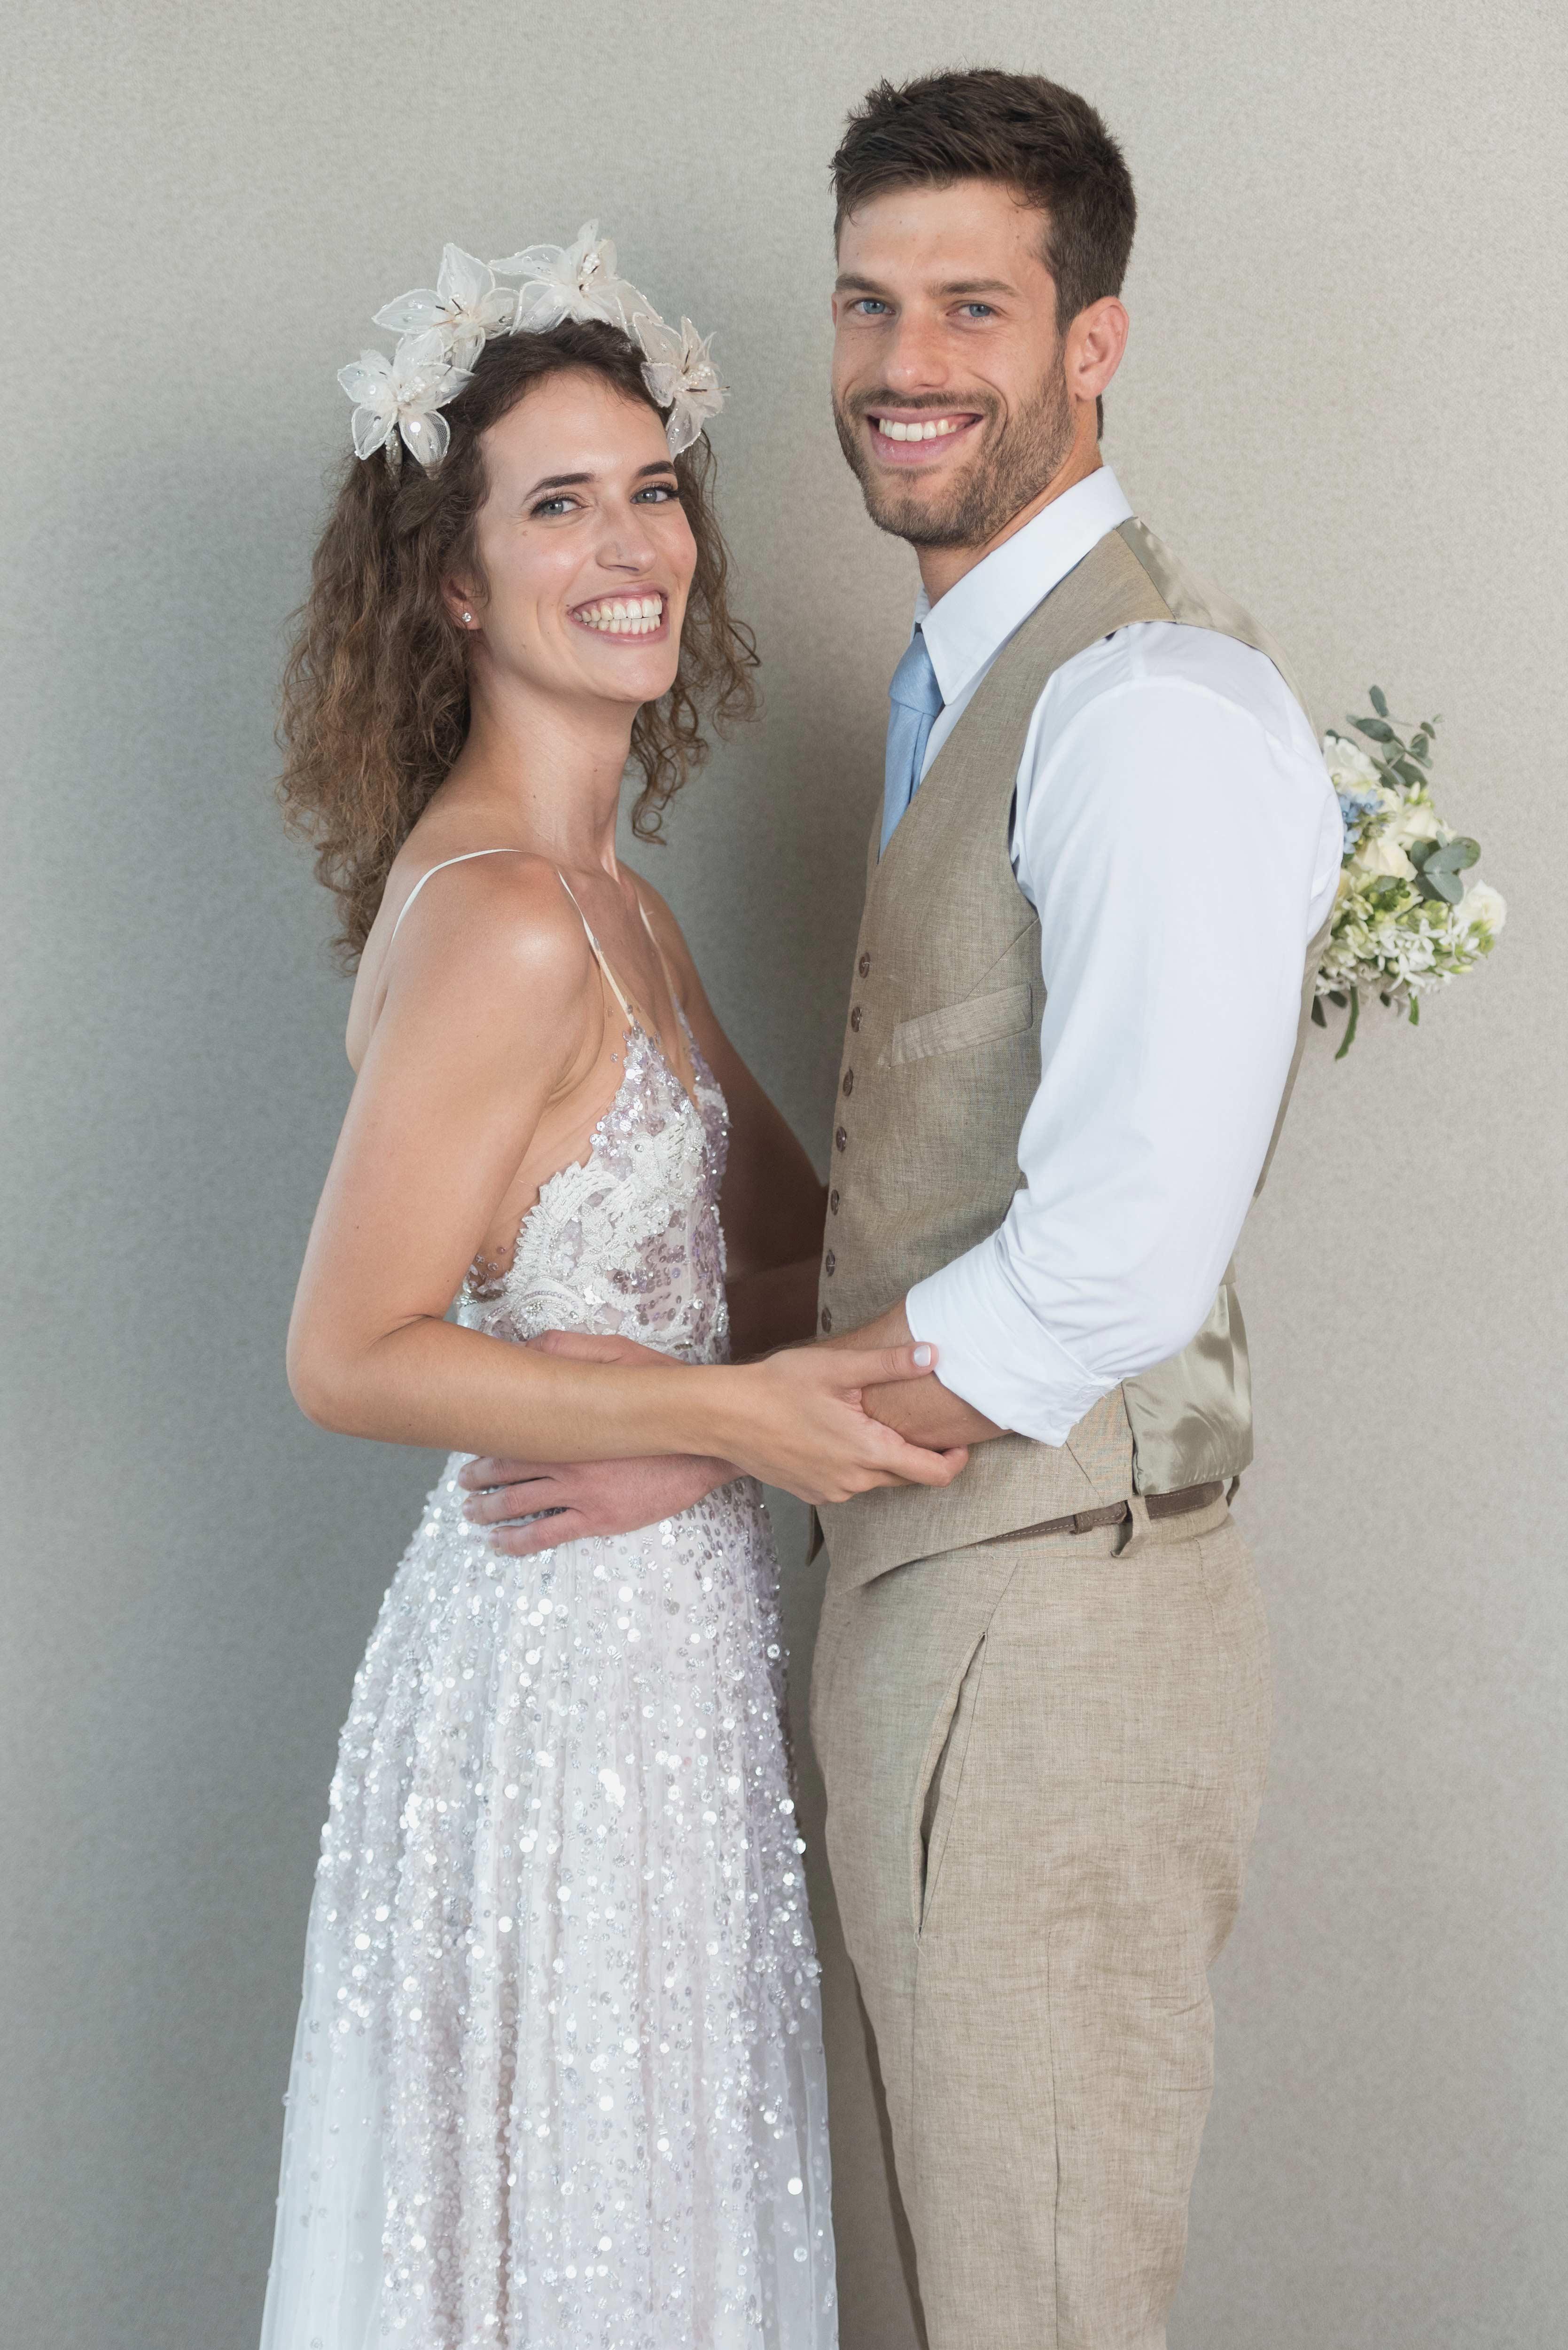 Custom Made Wedding: החתונה של הדר ואיתמר